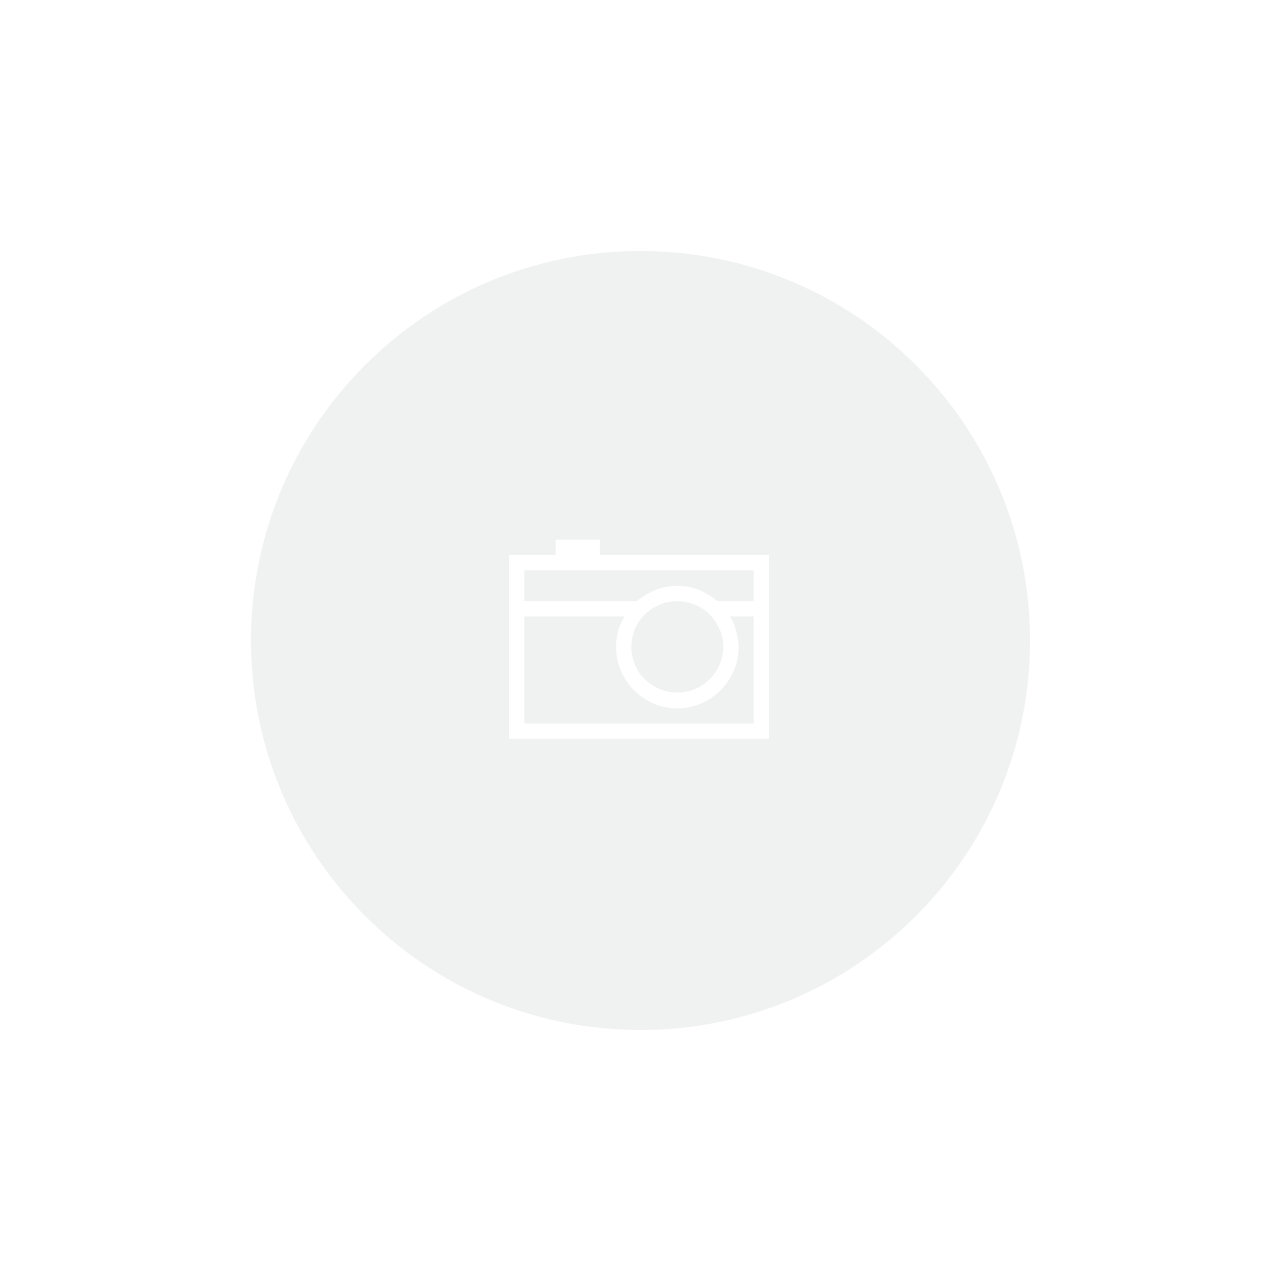 PLACA DE VIDEO EVGA GEFORCE GTX 1050 TI GAMING 4GB DDR5 -  04G-P4-6251-KR